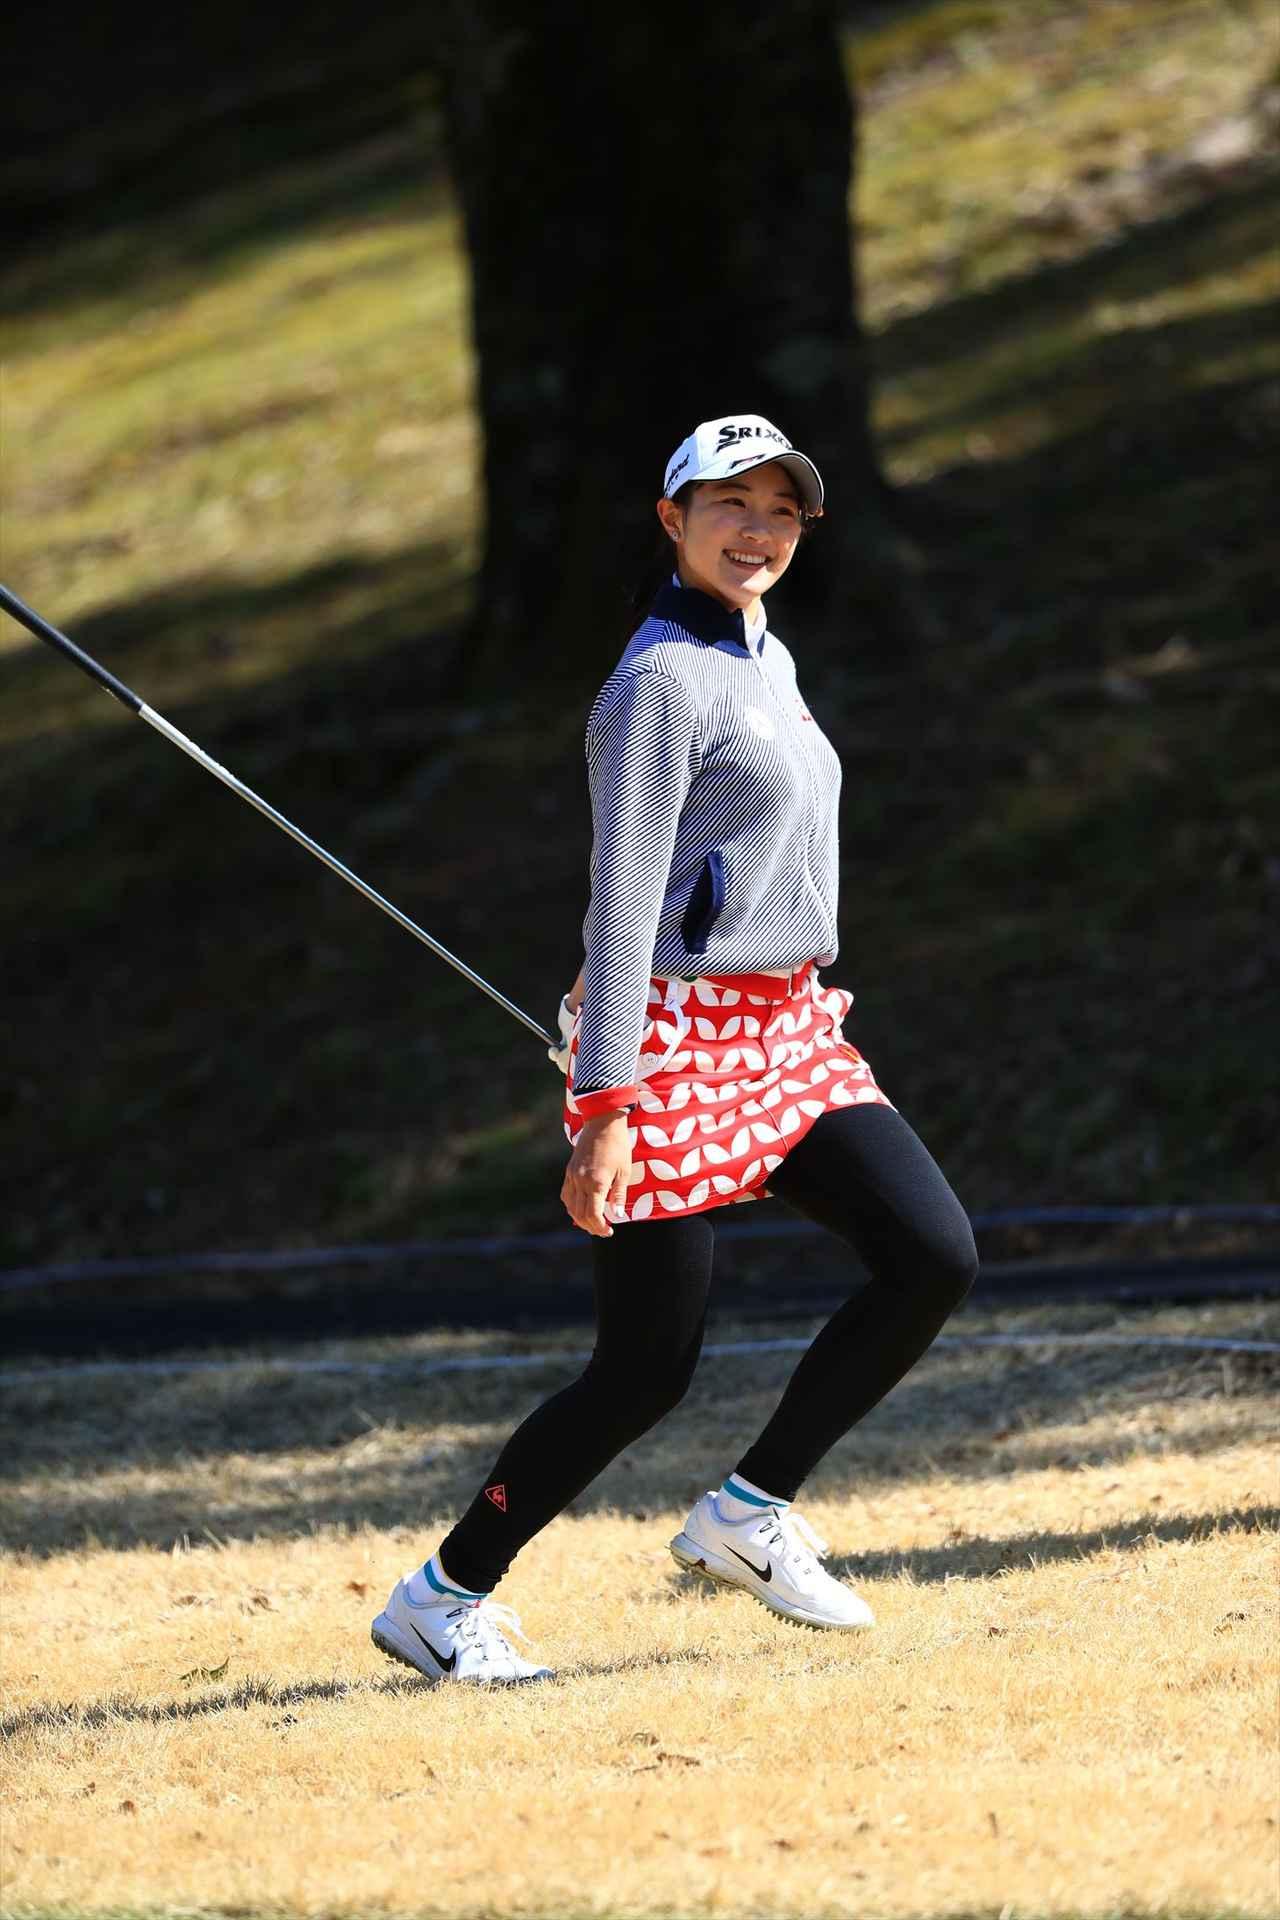 Images : 6番目の画像 - 三浦桃香写真館 - みんなのゴルフダイジェスト